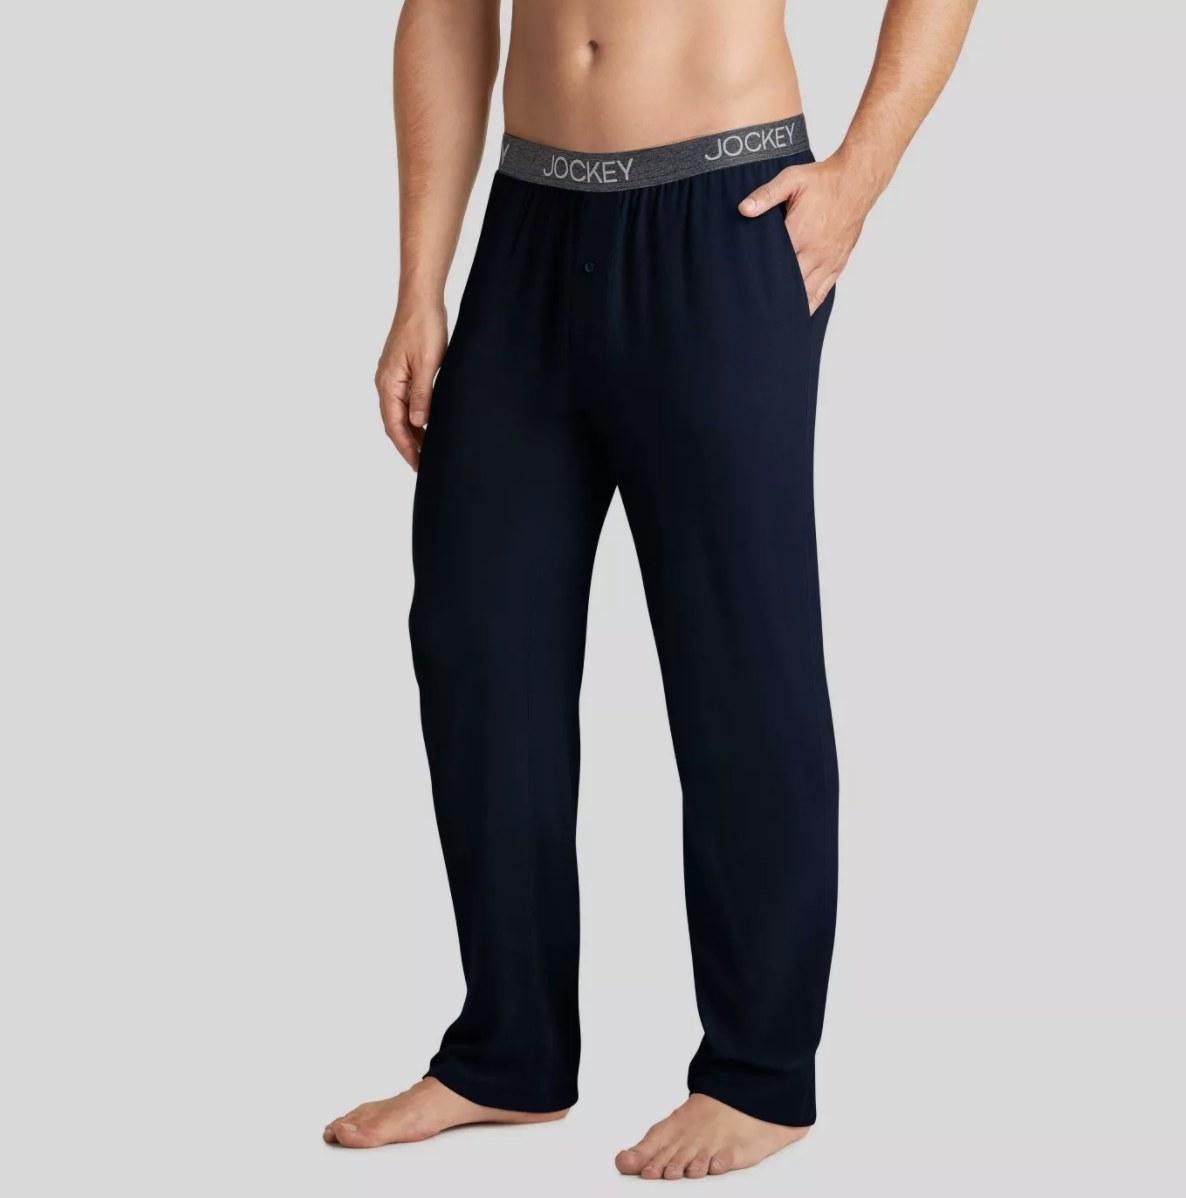 Model wearing the black pajama pants with a Jockey waistband